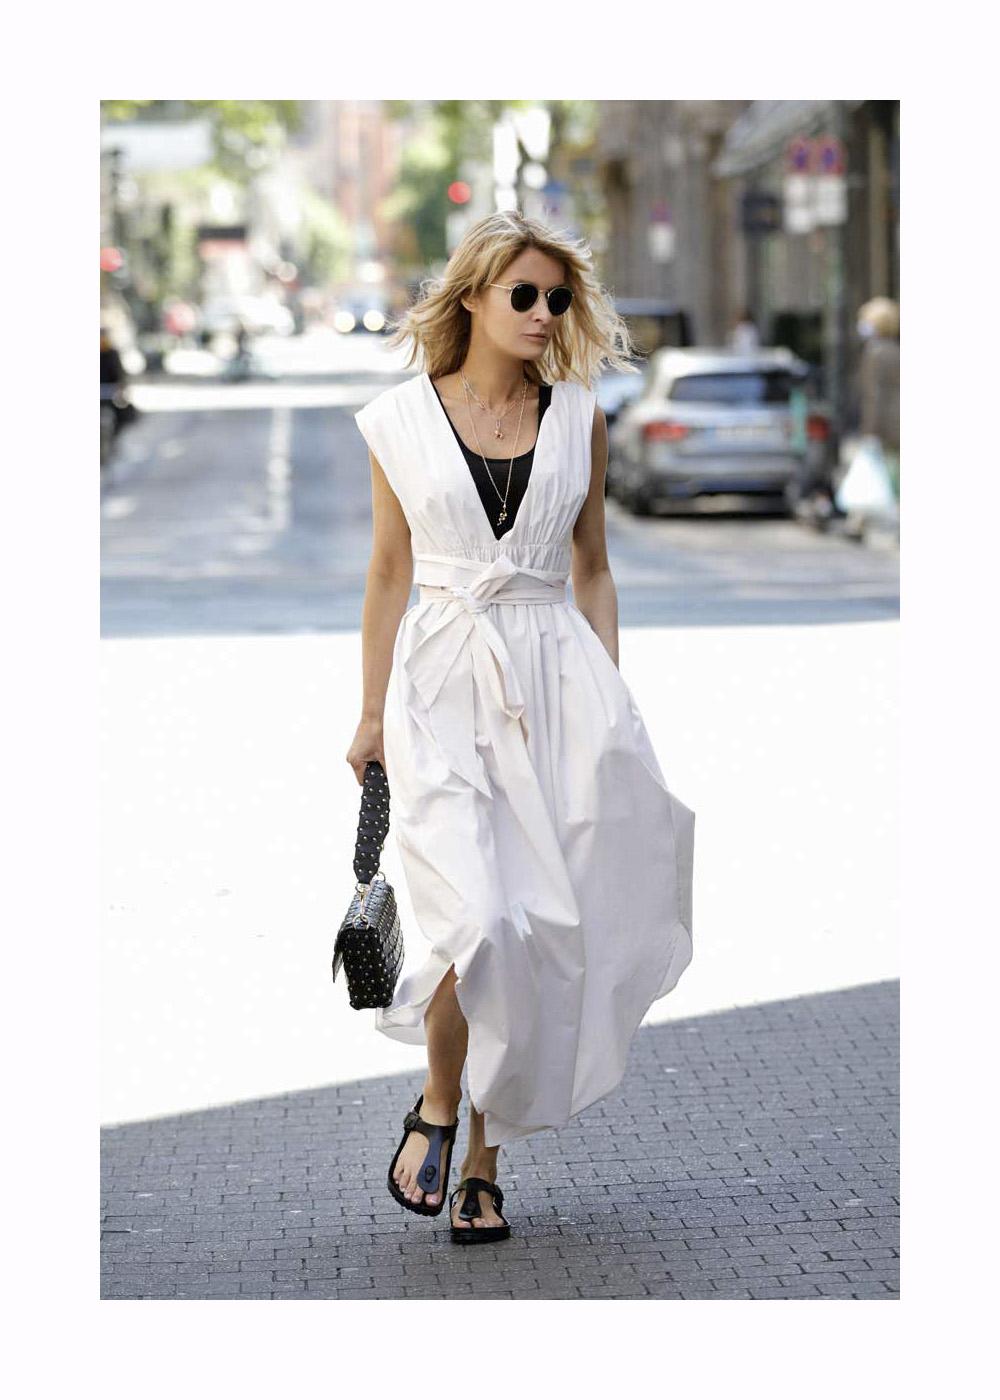 Street Style – Duesseldorf – May 15, 2020